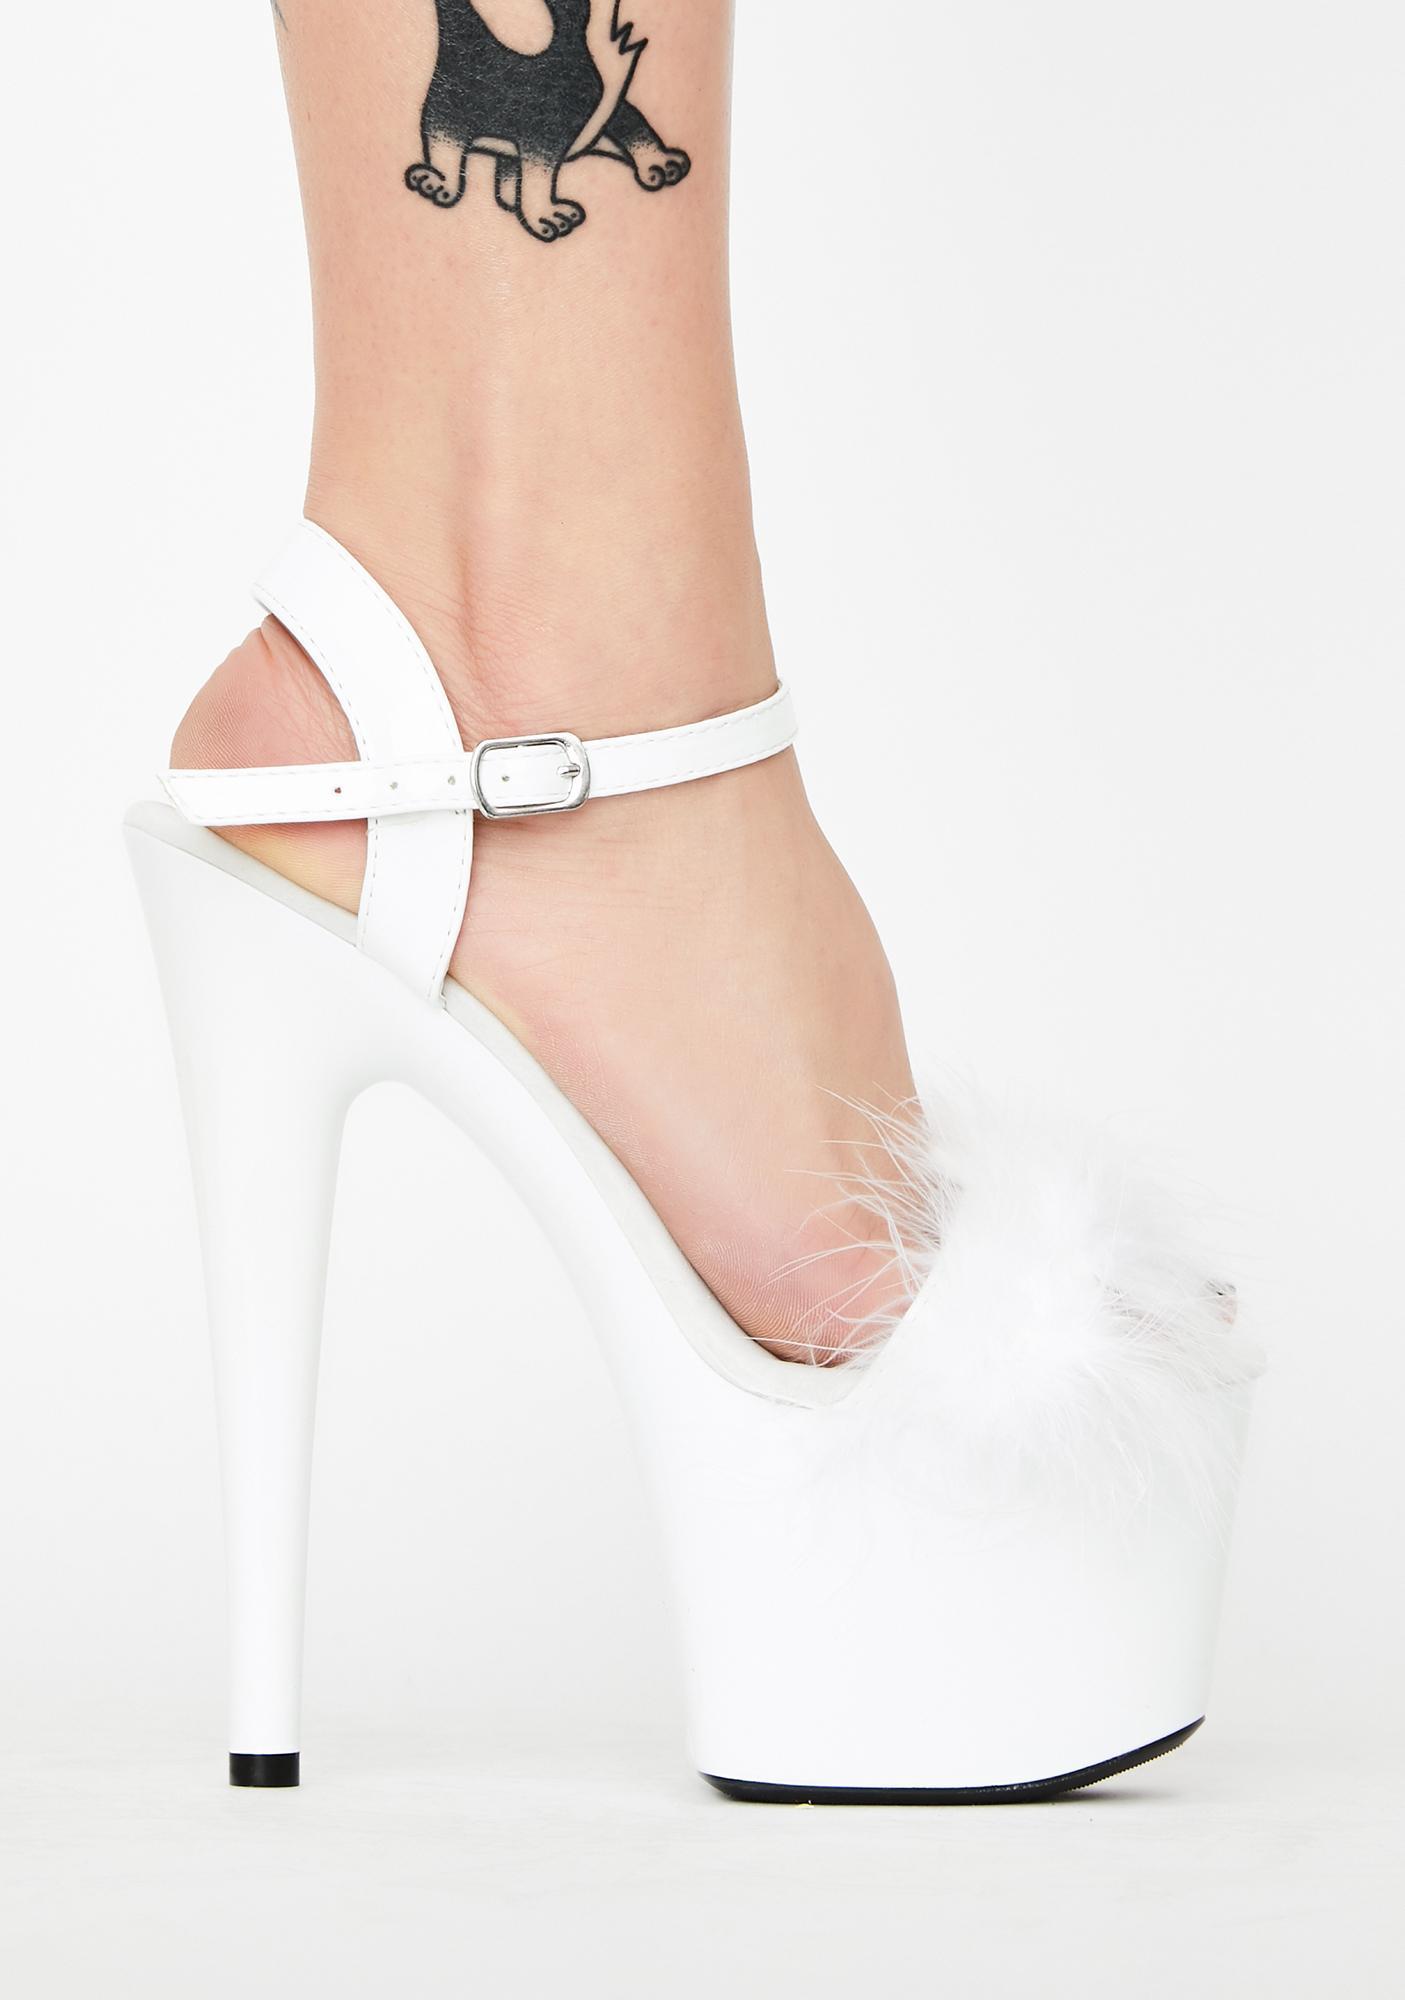 Purely Heartless Bish Platform Heels